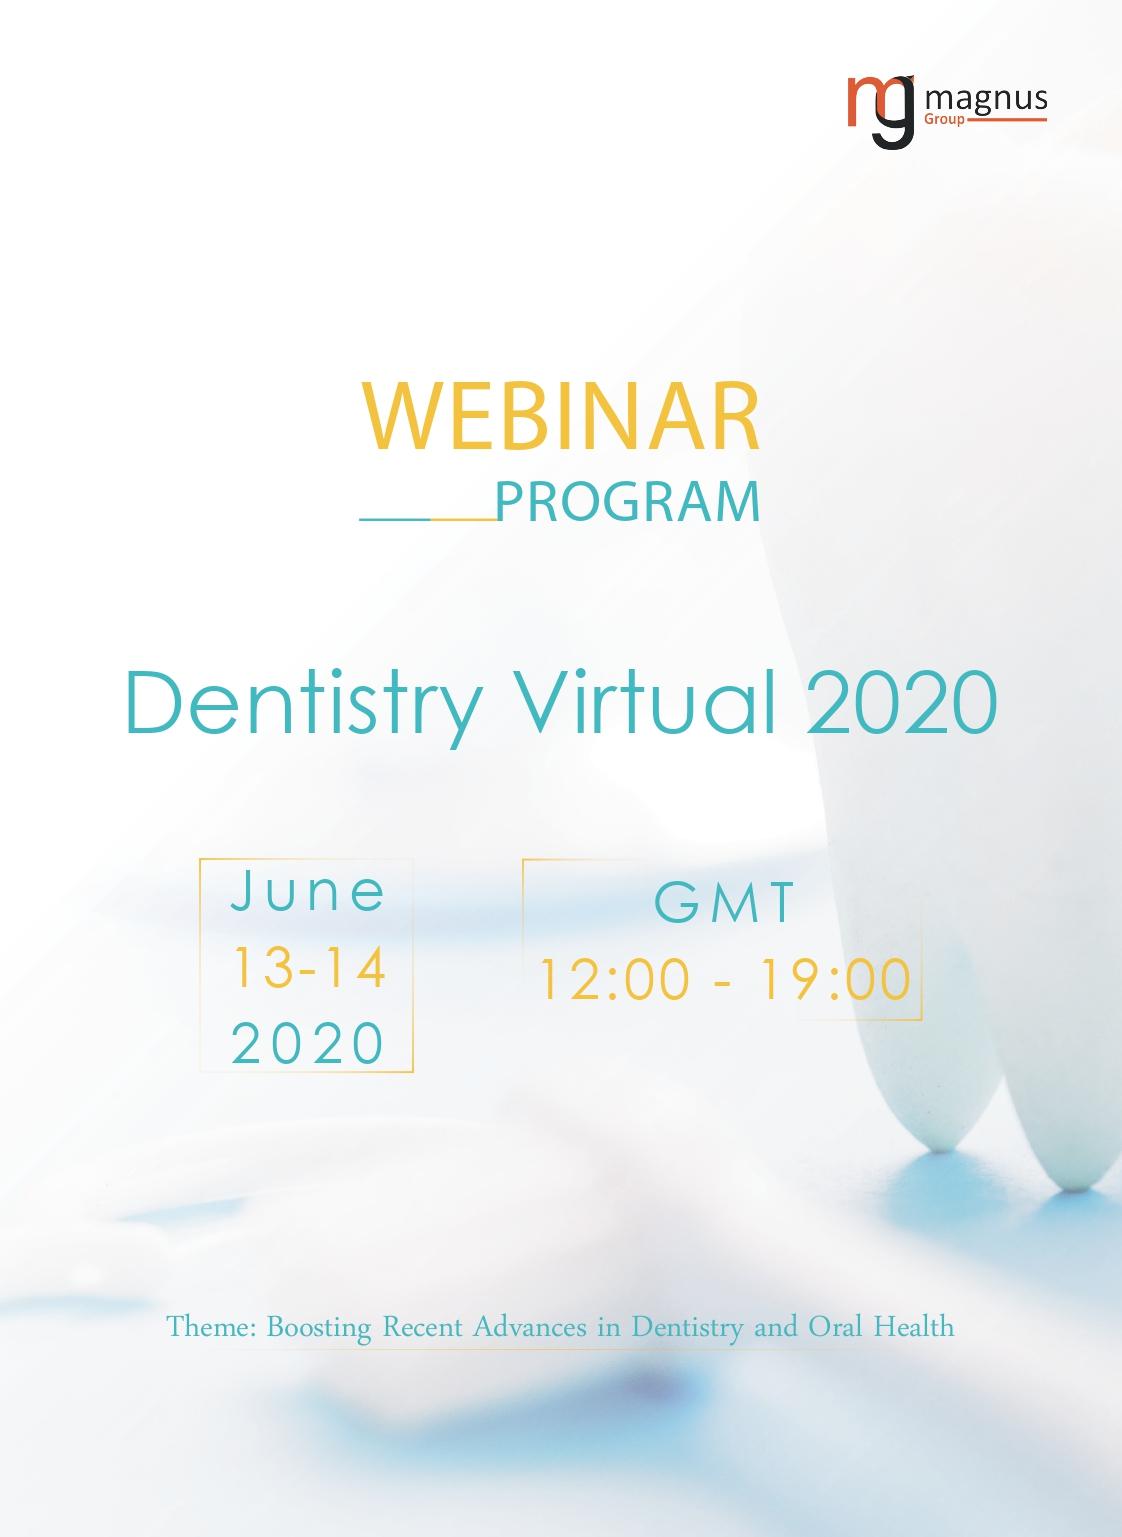 1st Edition of International Webinar on Dentistry and Oral Health | Online Event Program